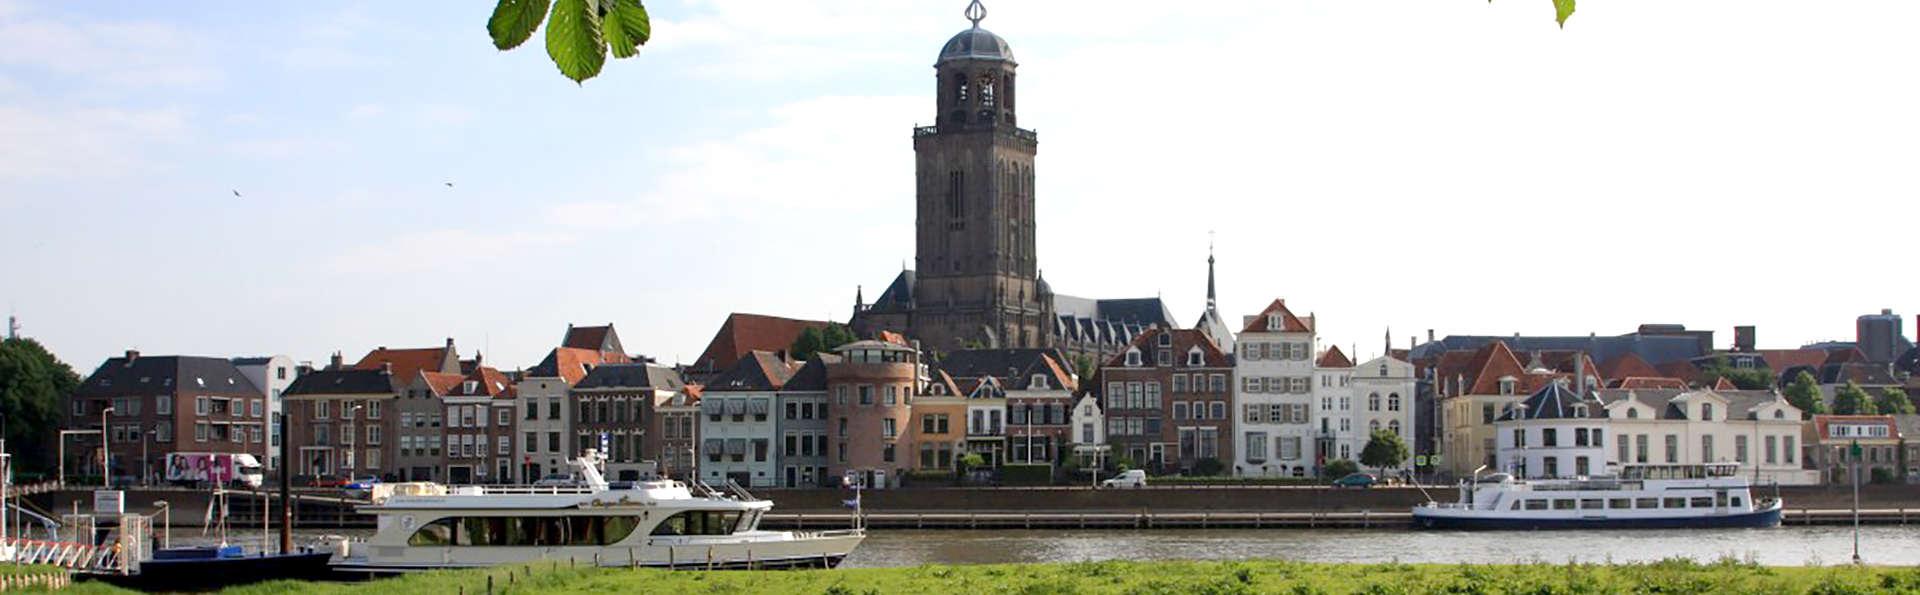 Sandton IJsselhotel - Edit_Destinatio2n.jpg